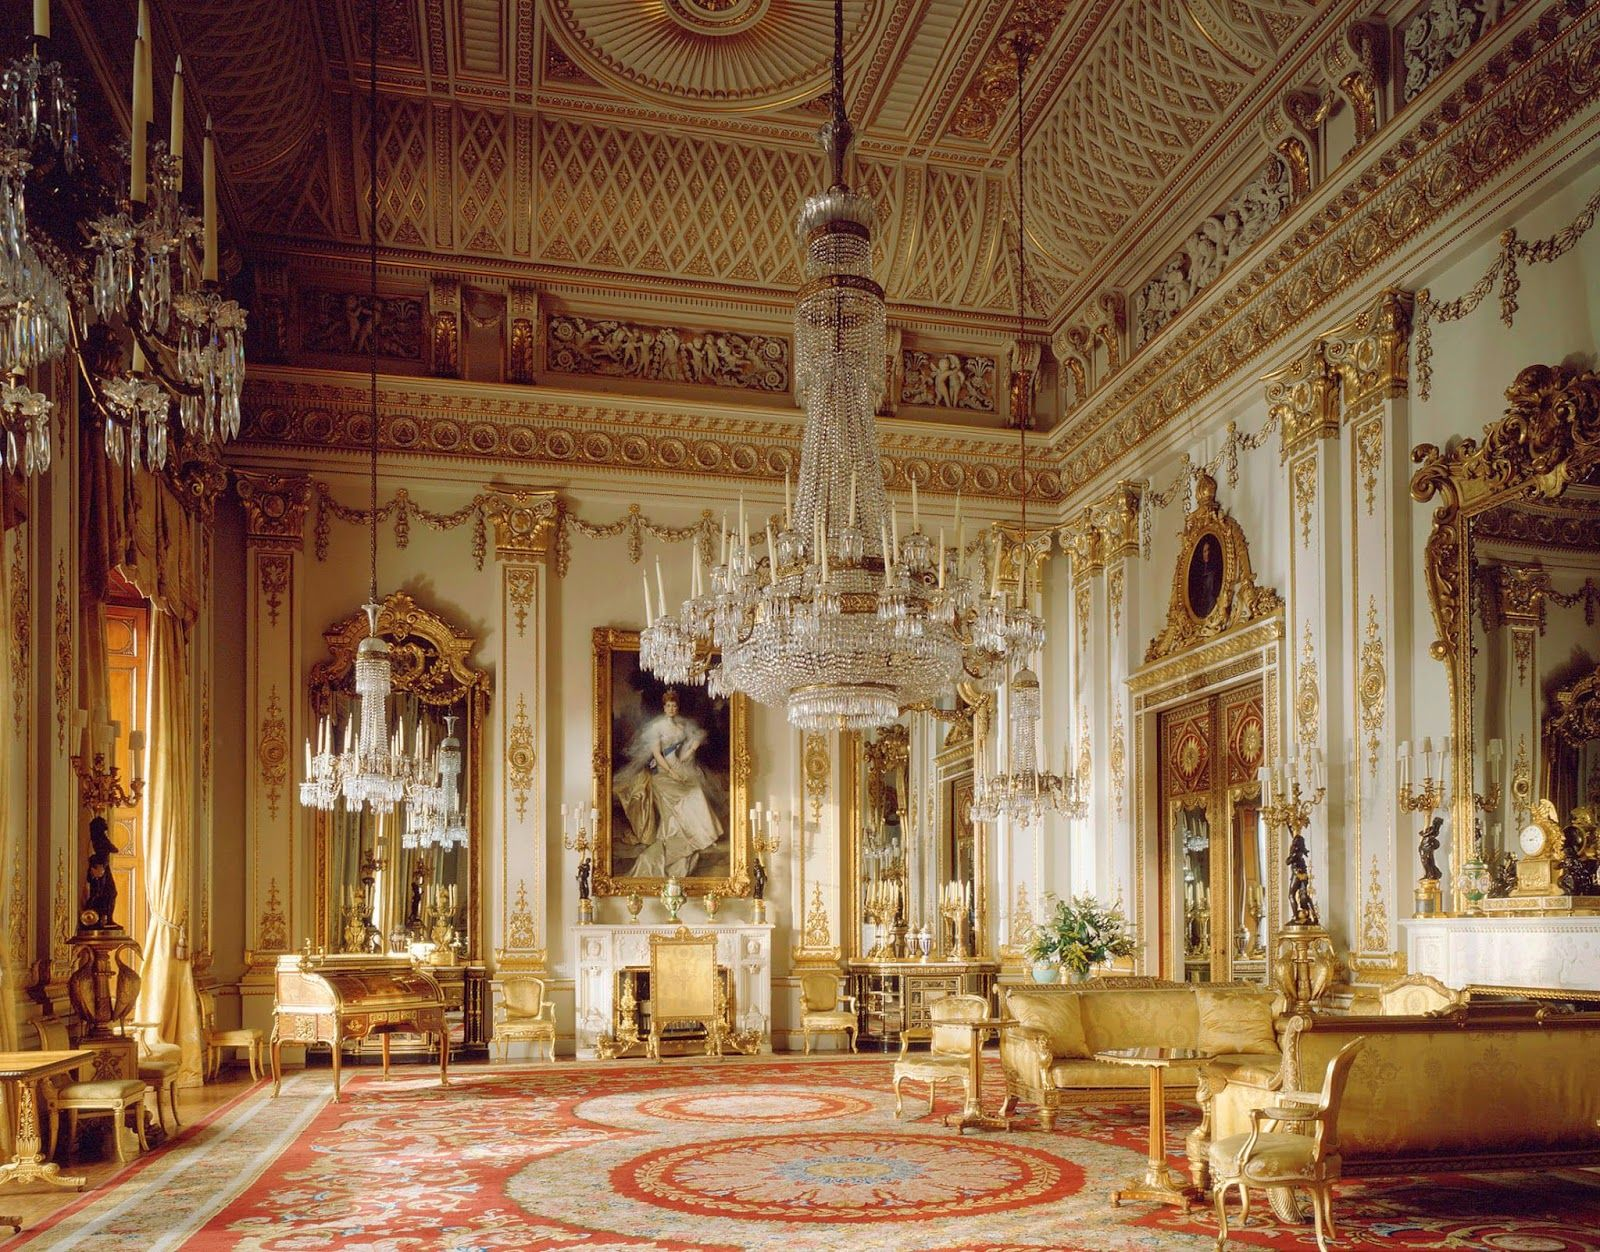 castle interior design. Belvoir Castle Interior Design OR - Google Search